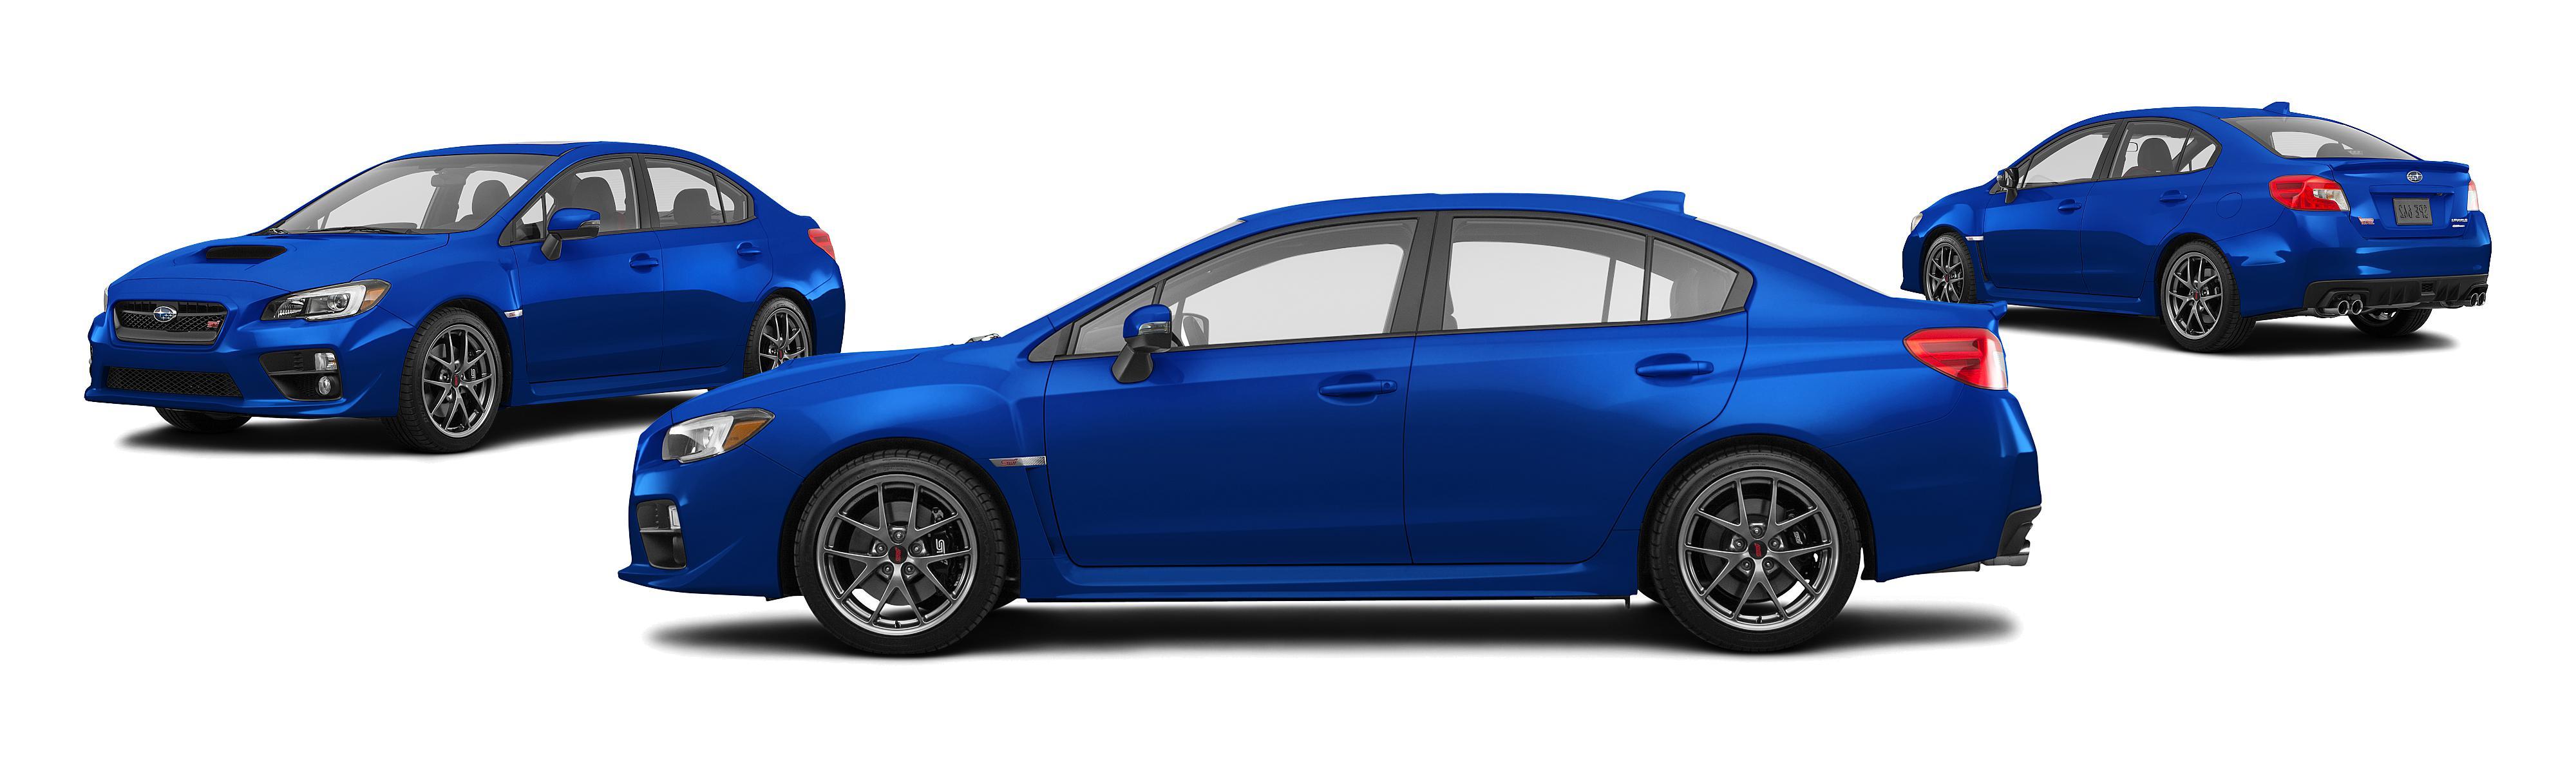 2017 Subaru Wrx Awd Sti Limited 4dr Sedan W Wing Spoiler Research Groovecar